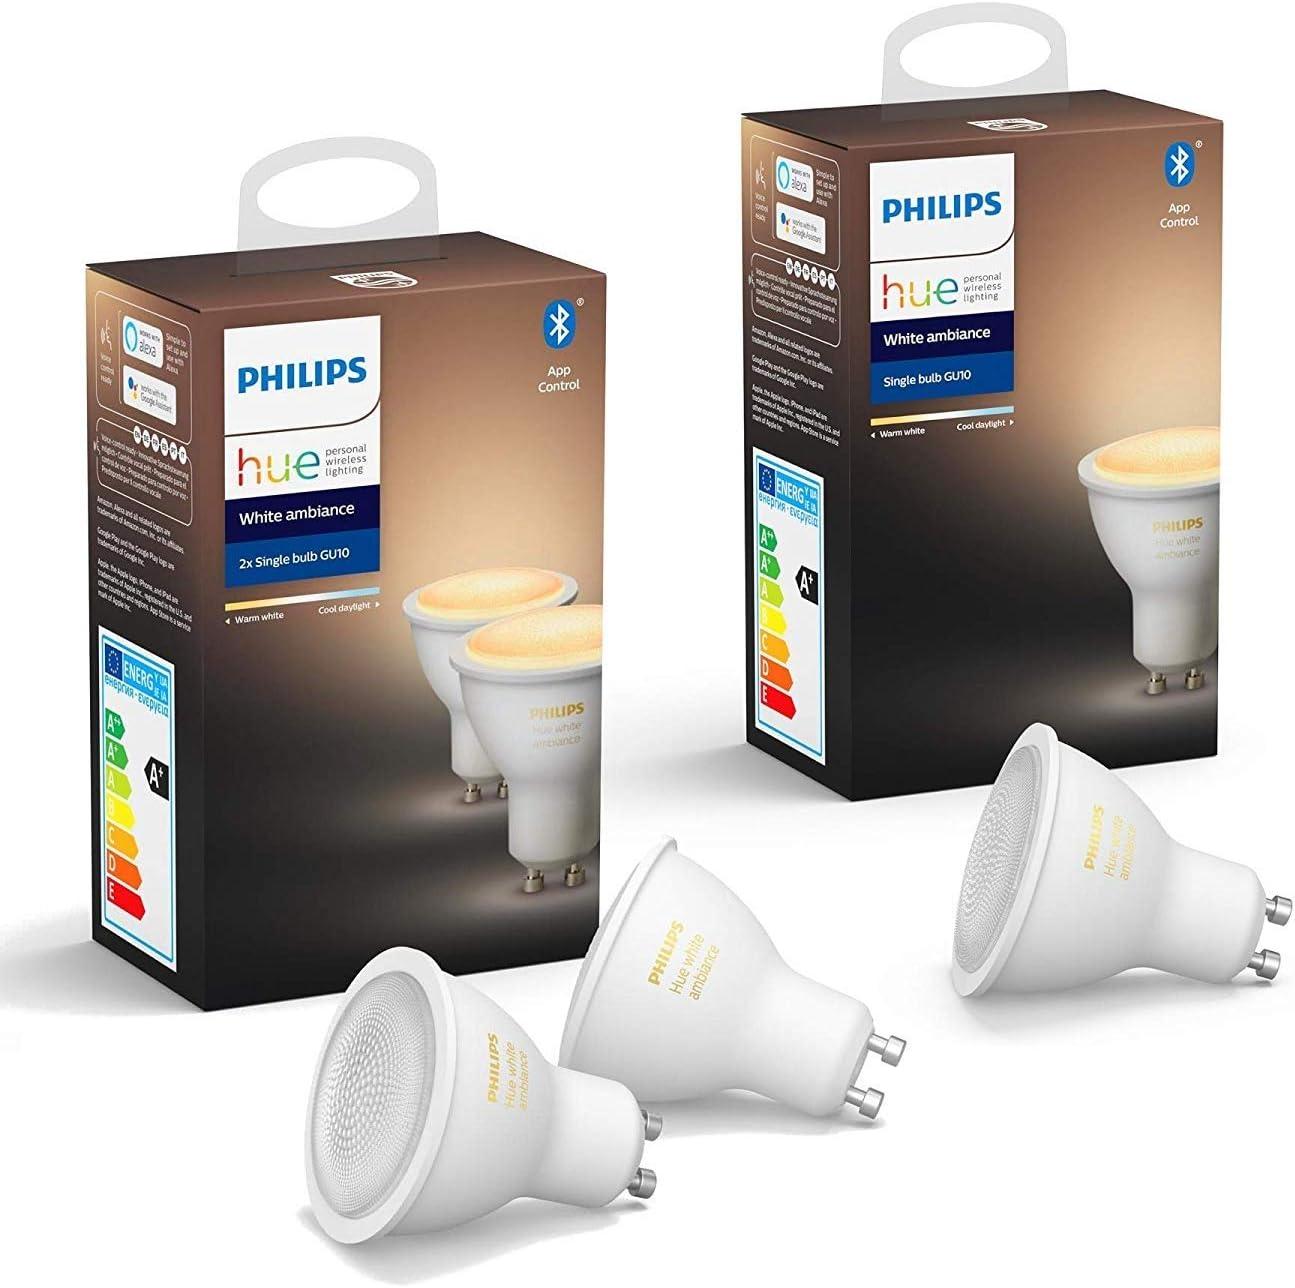 3er Set Philips Hue White Ambiance GU10 Lampen